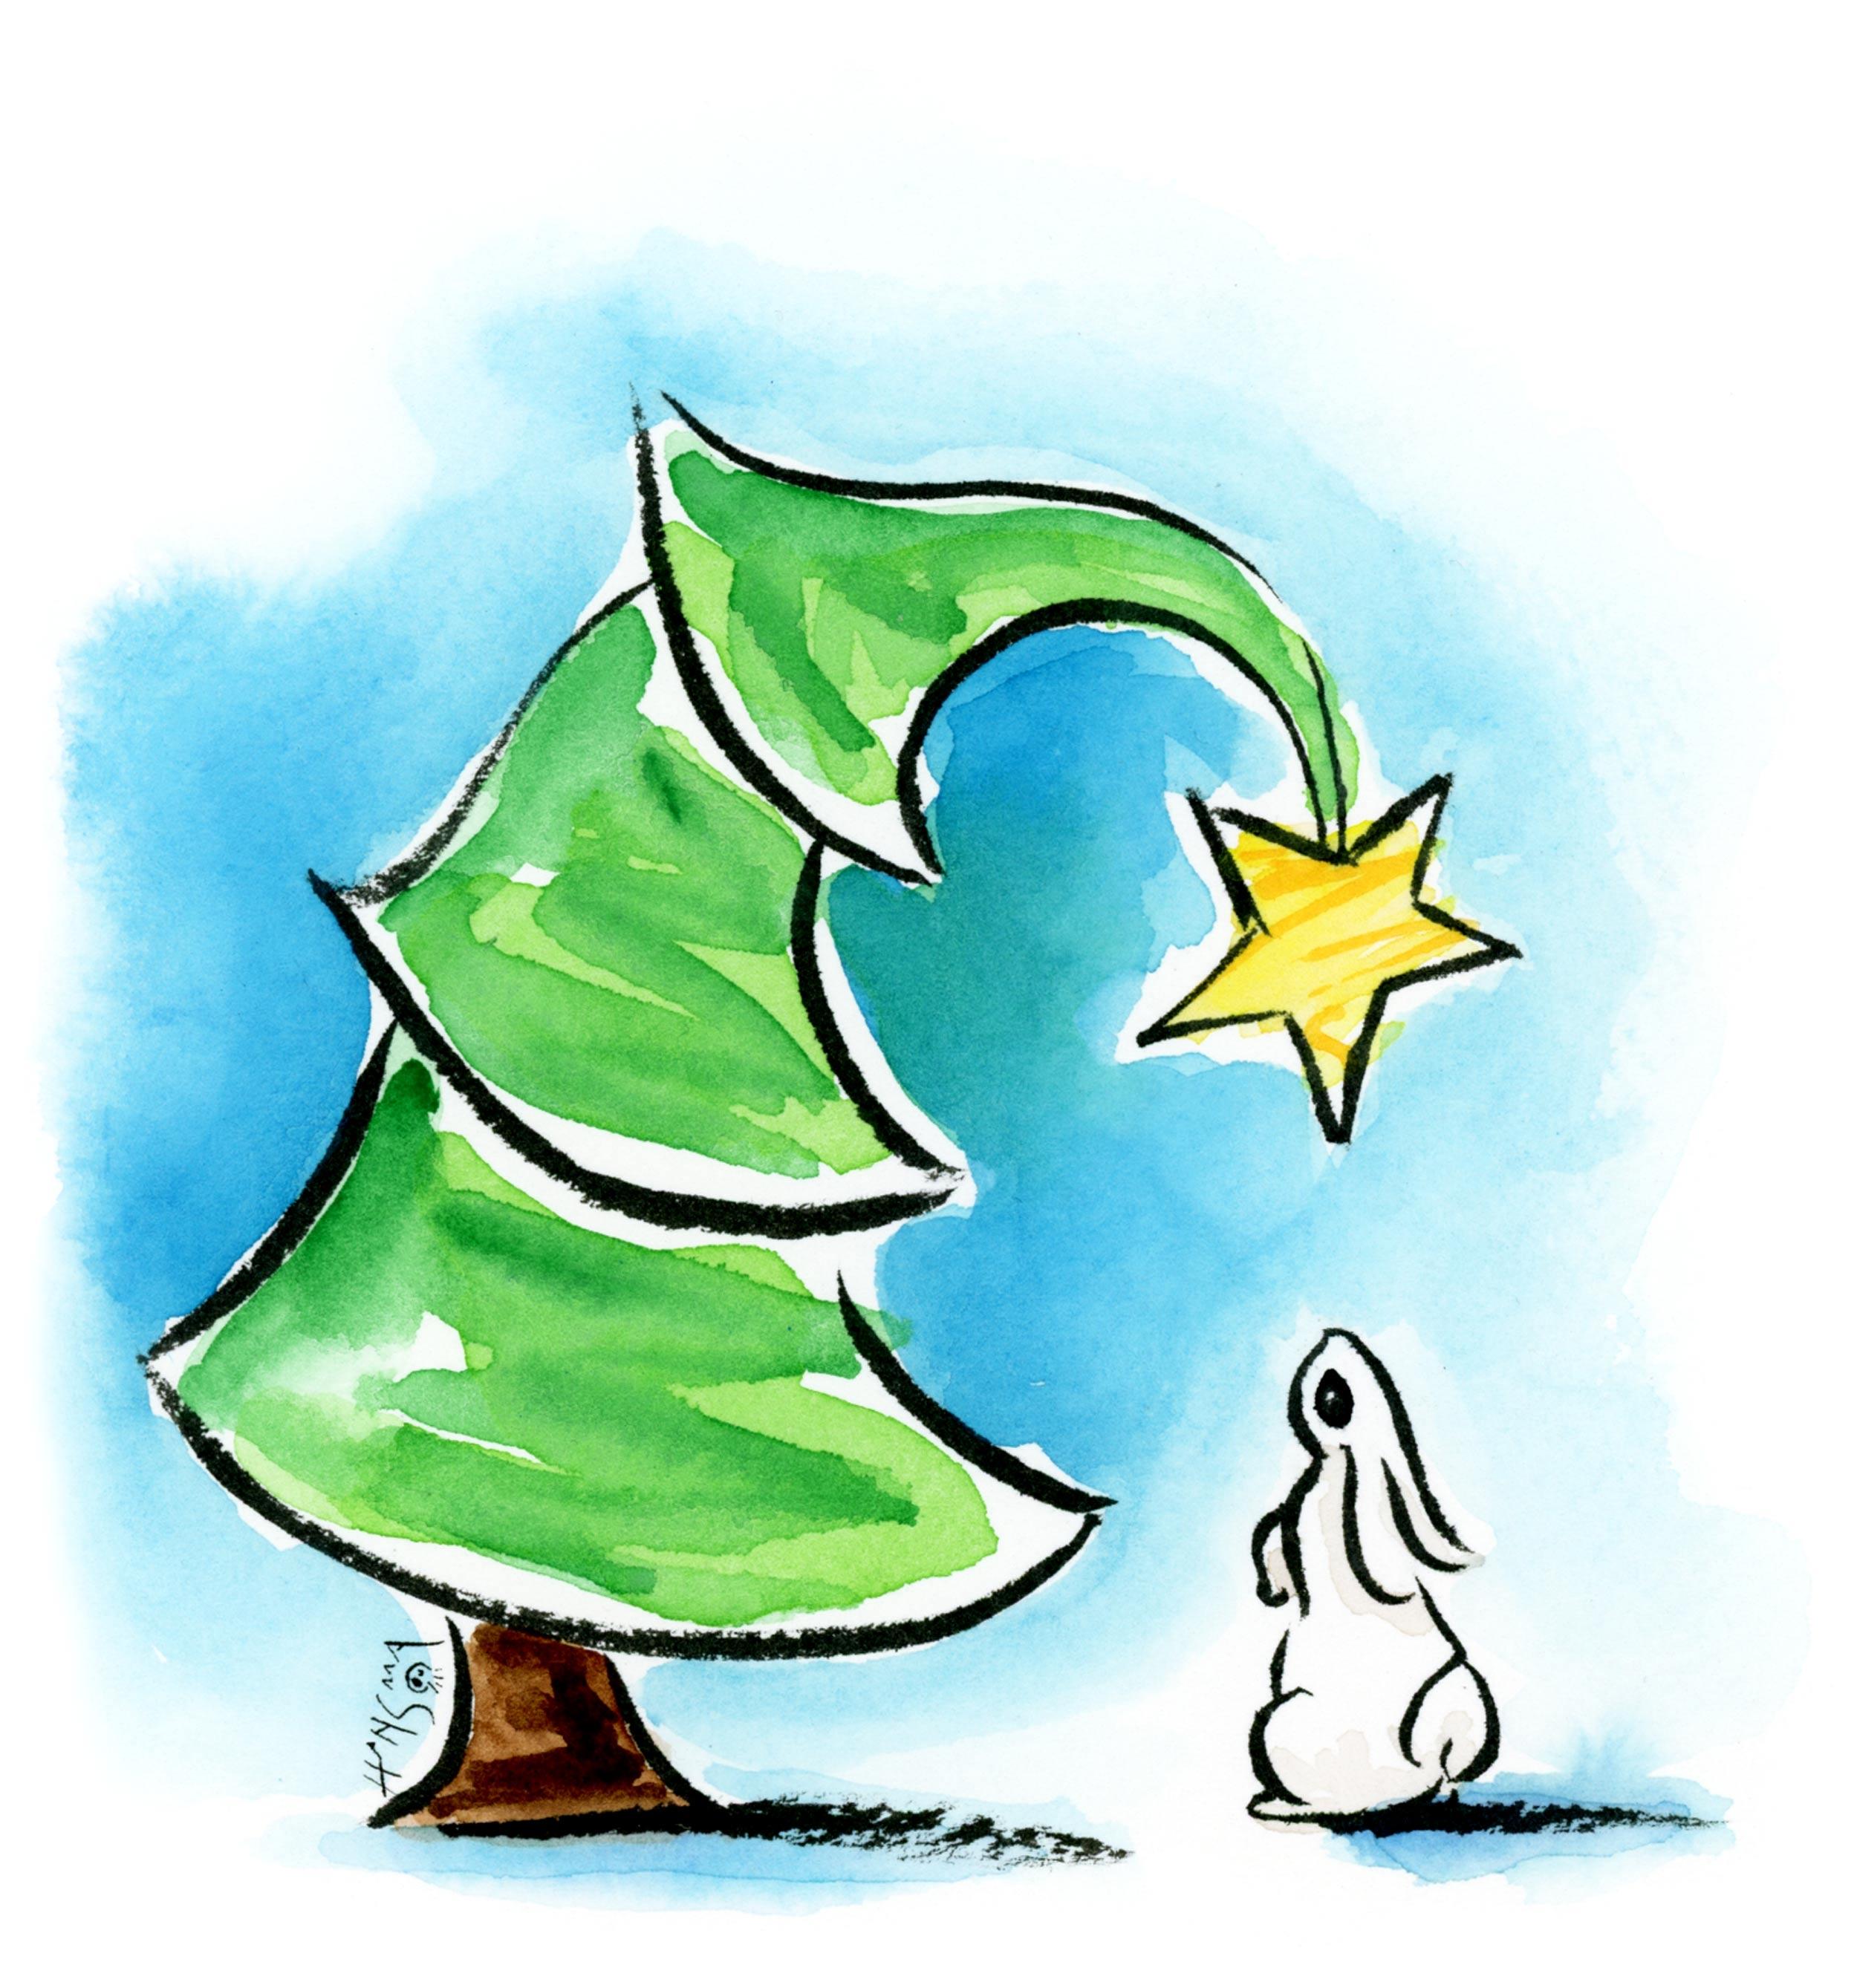 xmas-star-bunny.jpg